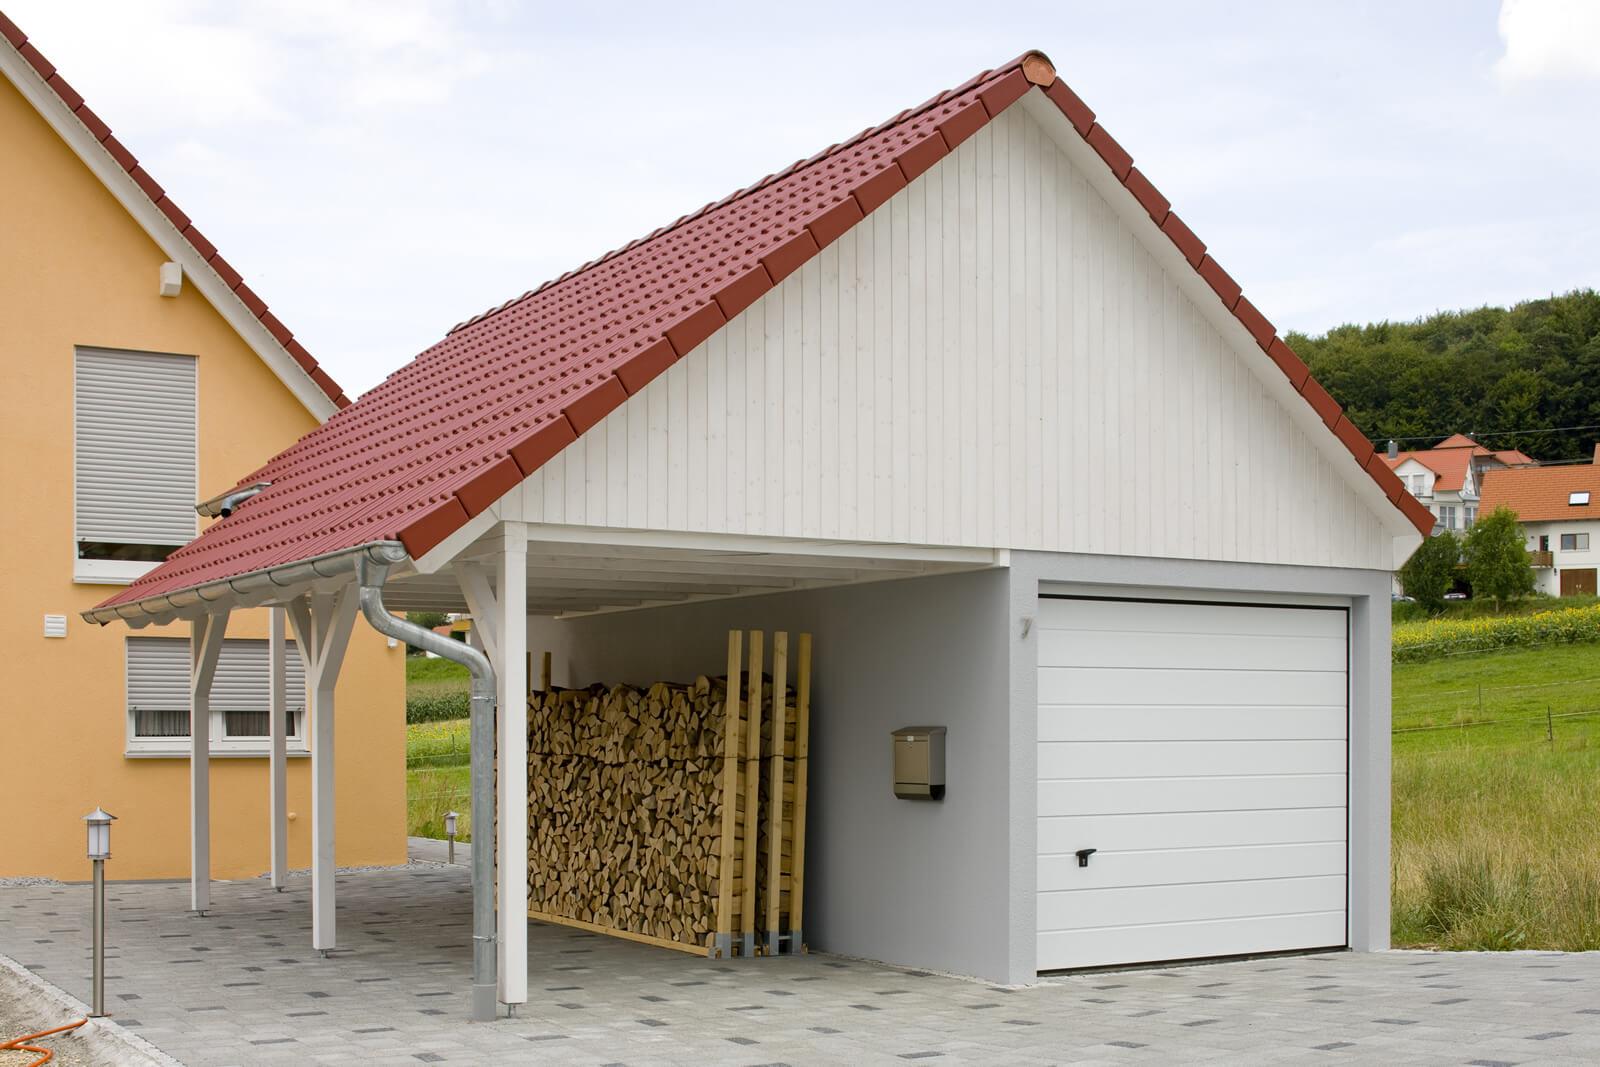 Fertiggarage beton  Einzelgarage als Beton-Fertiggarage